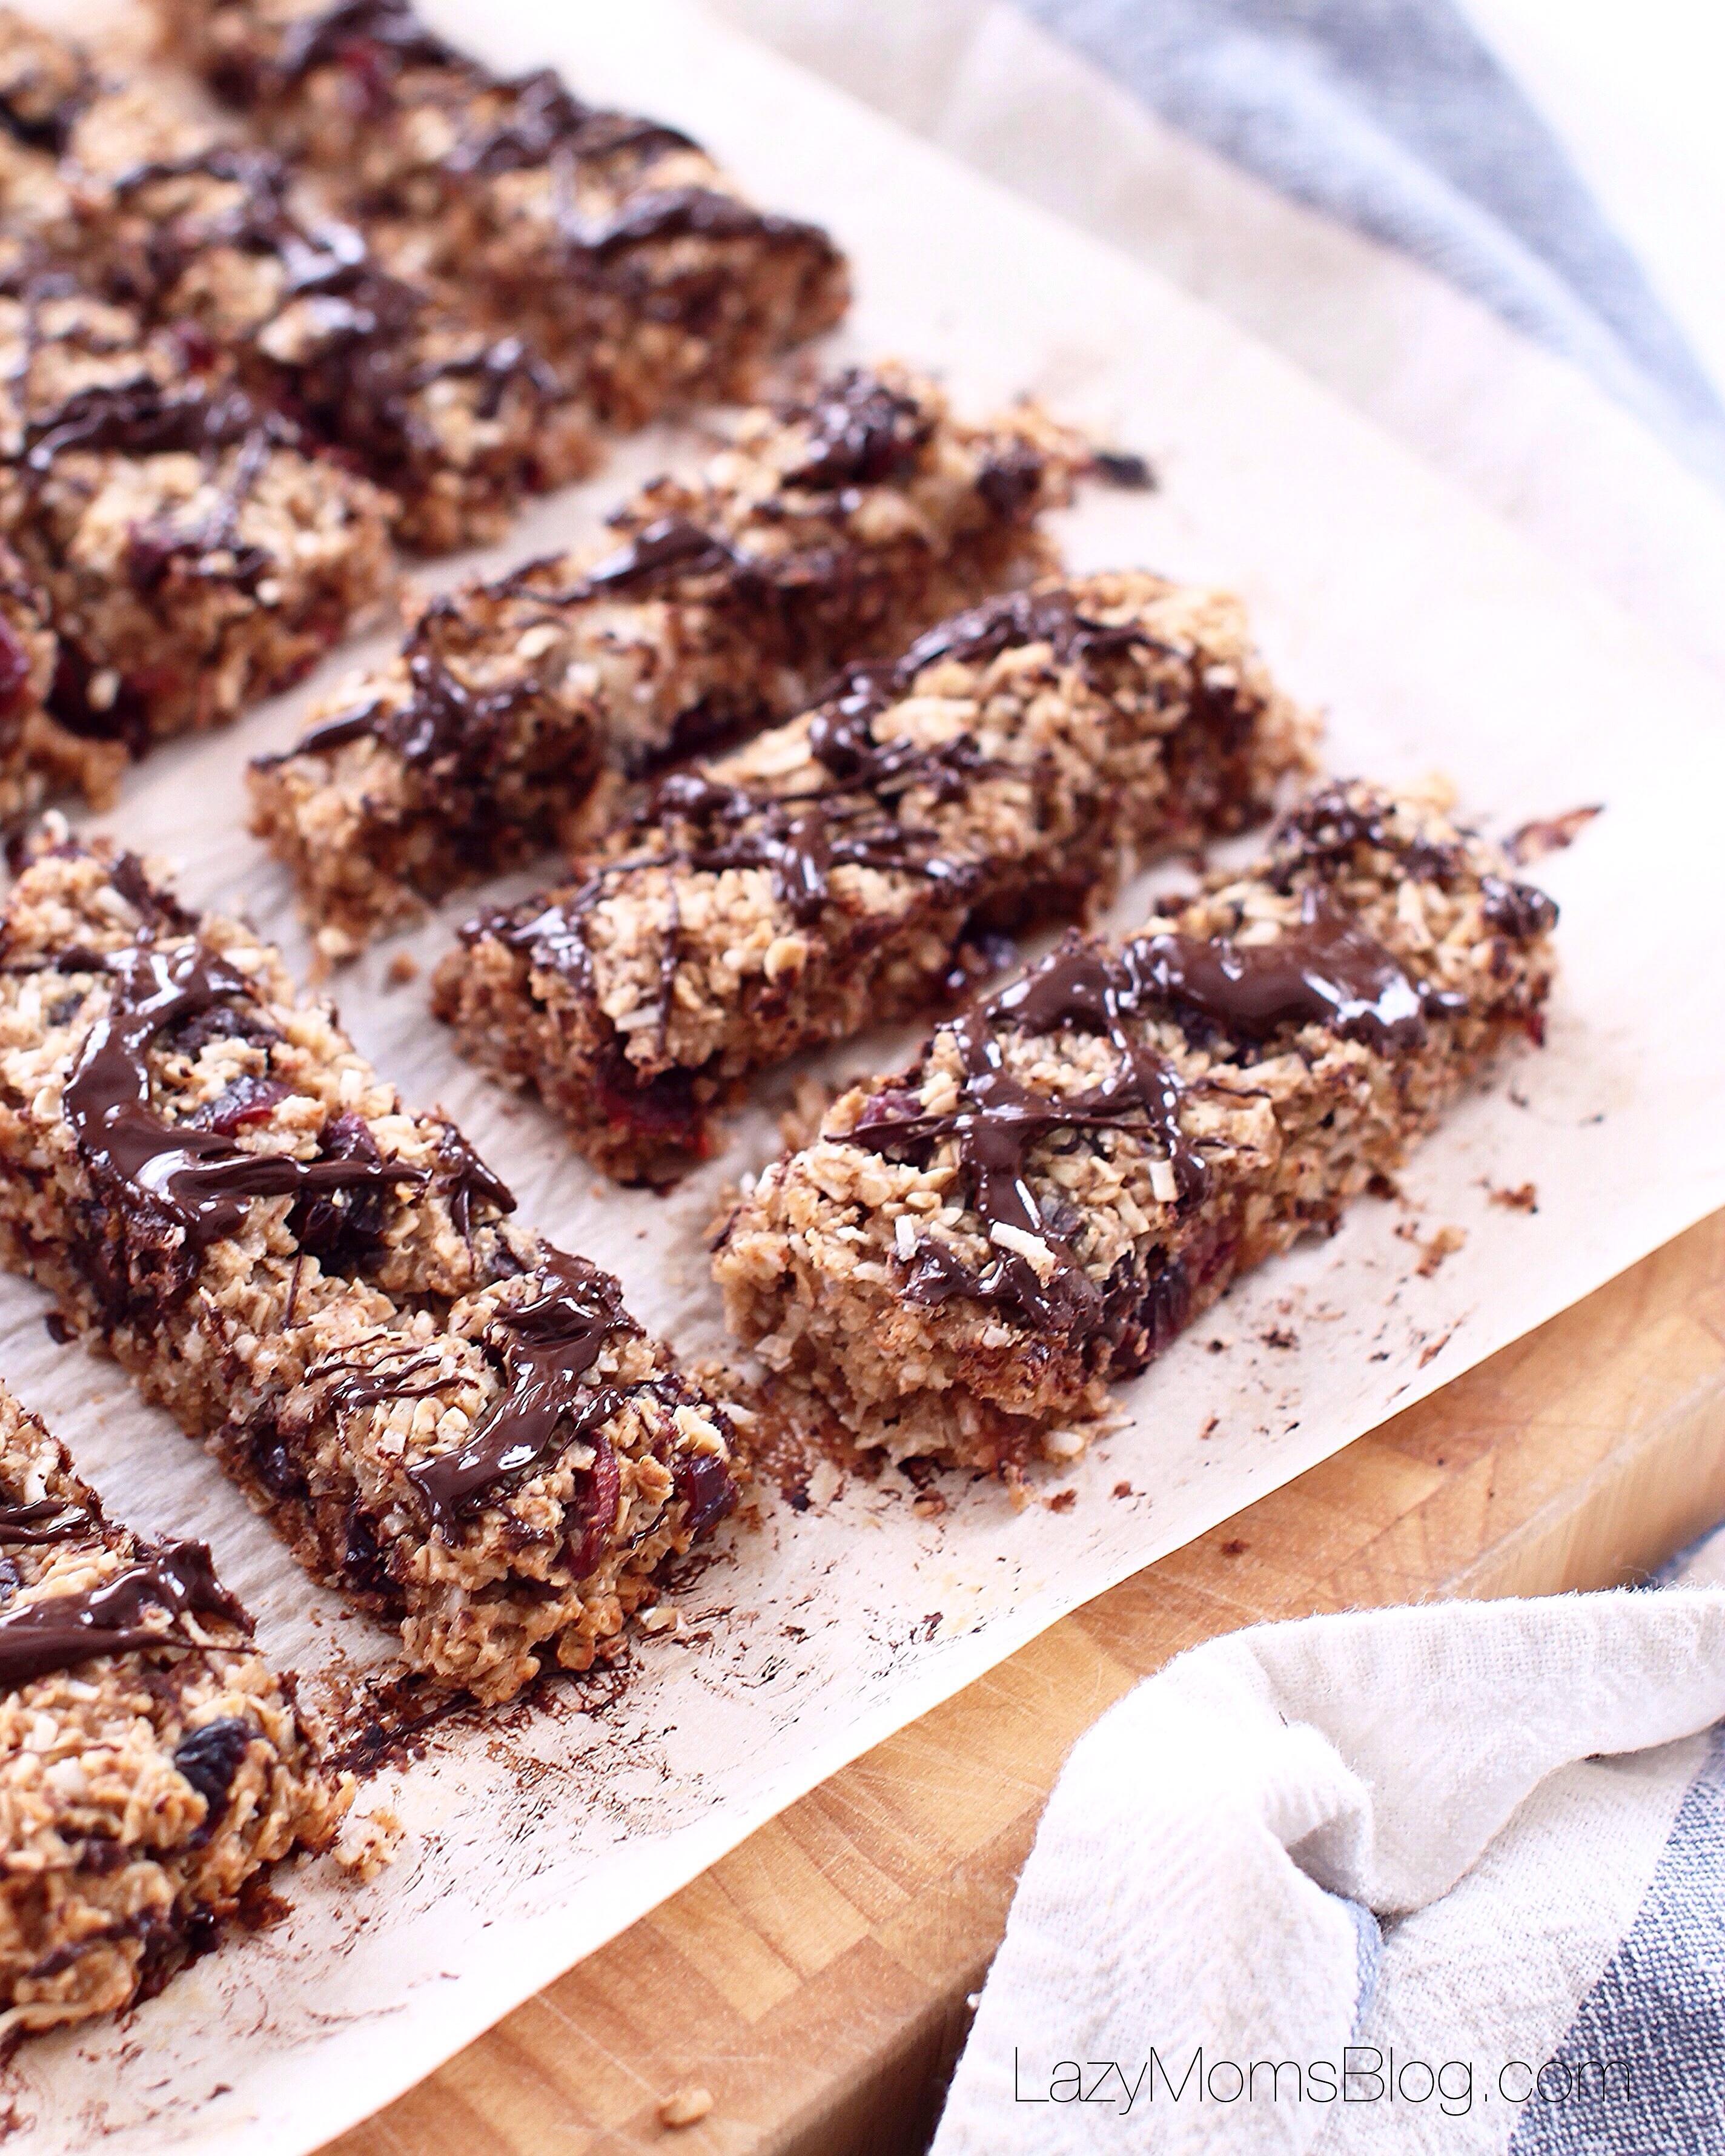 The best homemade granola bars